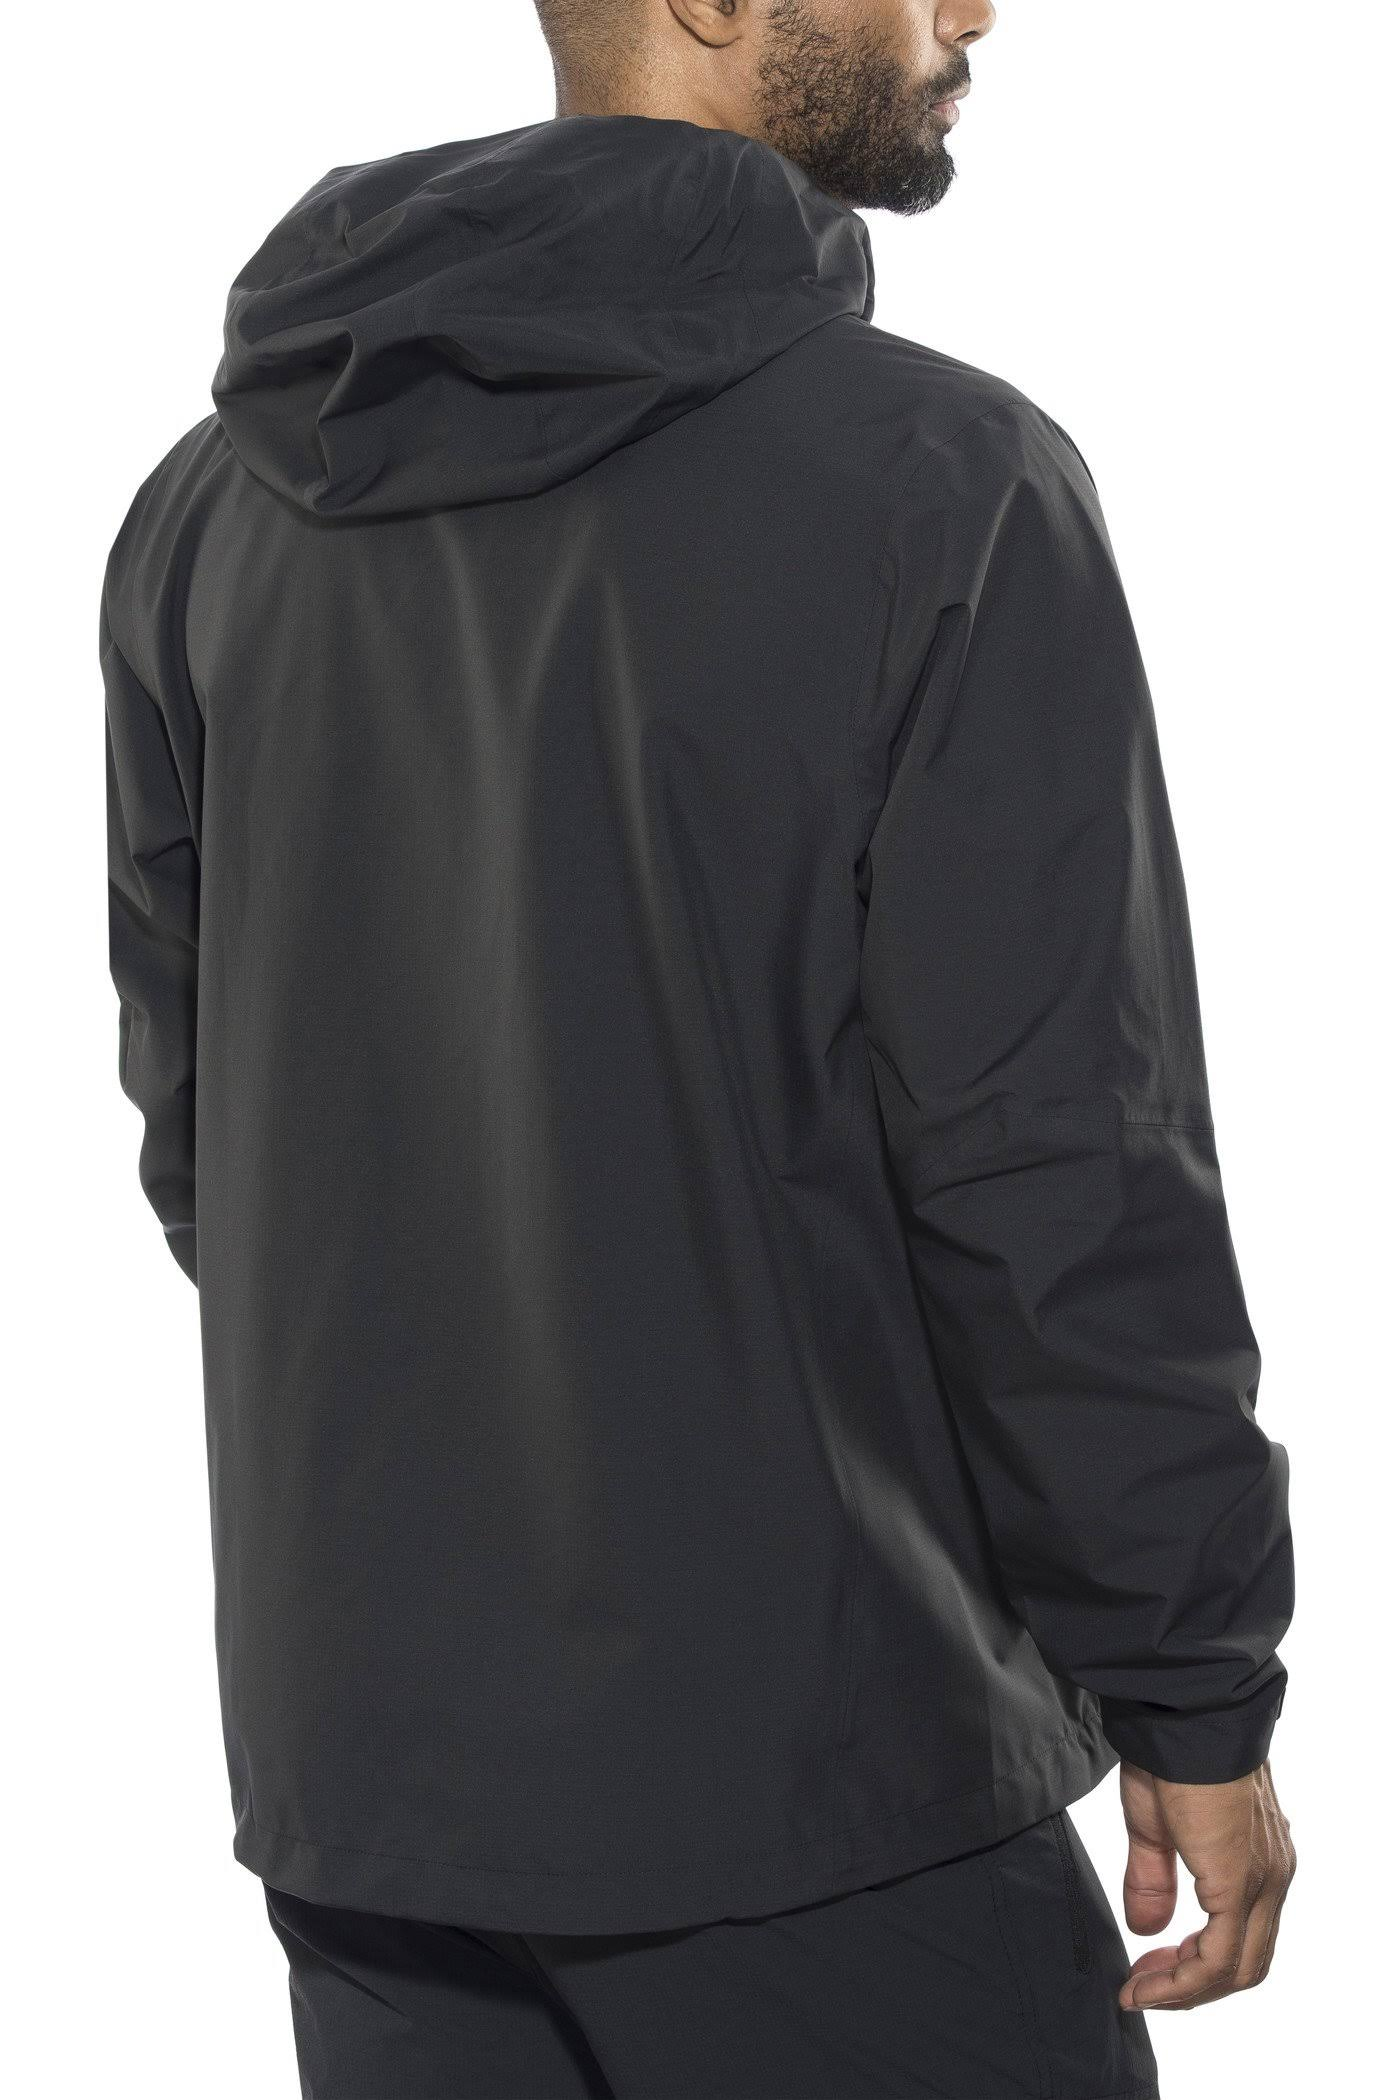 blk Größe 83675 Herren Ridge Style Cloud Jacket L Patagonia pqzA7Hx